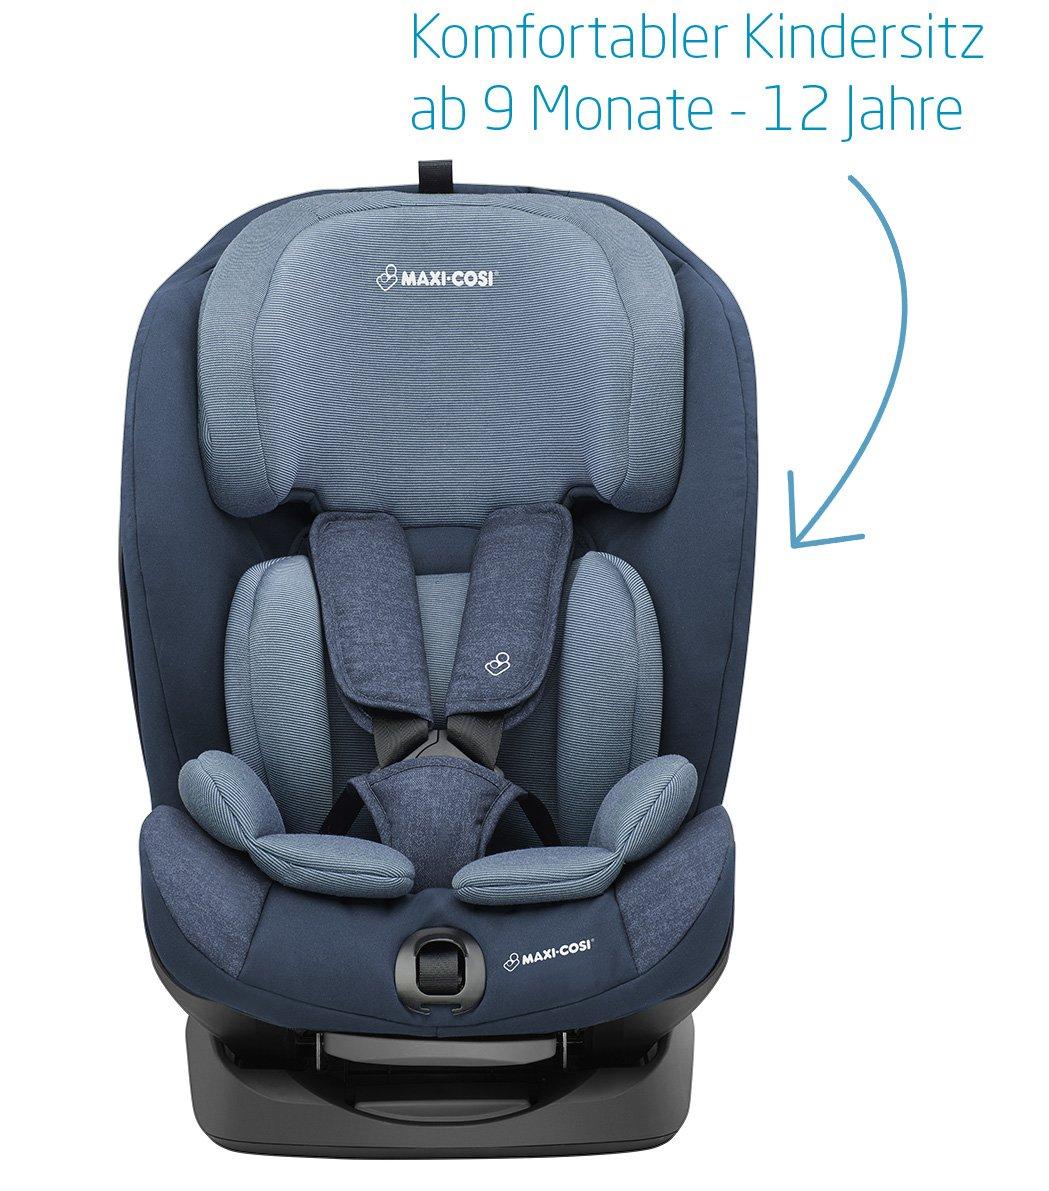 Maxi-Cosi 8603243110 - Titan niños asiento 9 - 36 kg con Isofix (Grupo 1/2/3), saco de asiento infantil para coche 123 con posición de dormir, Nomad Blue, ...